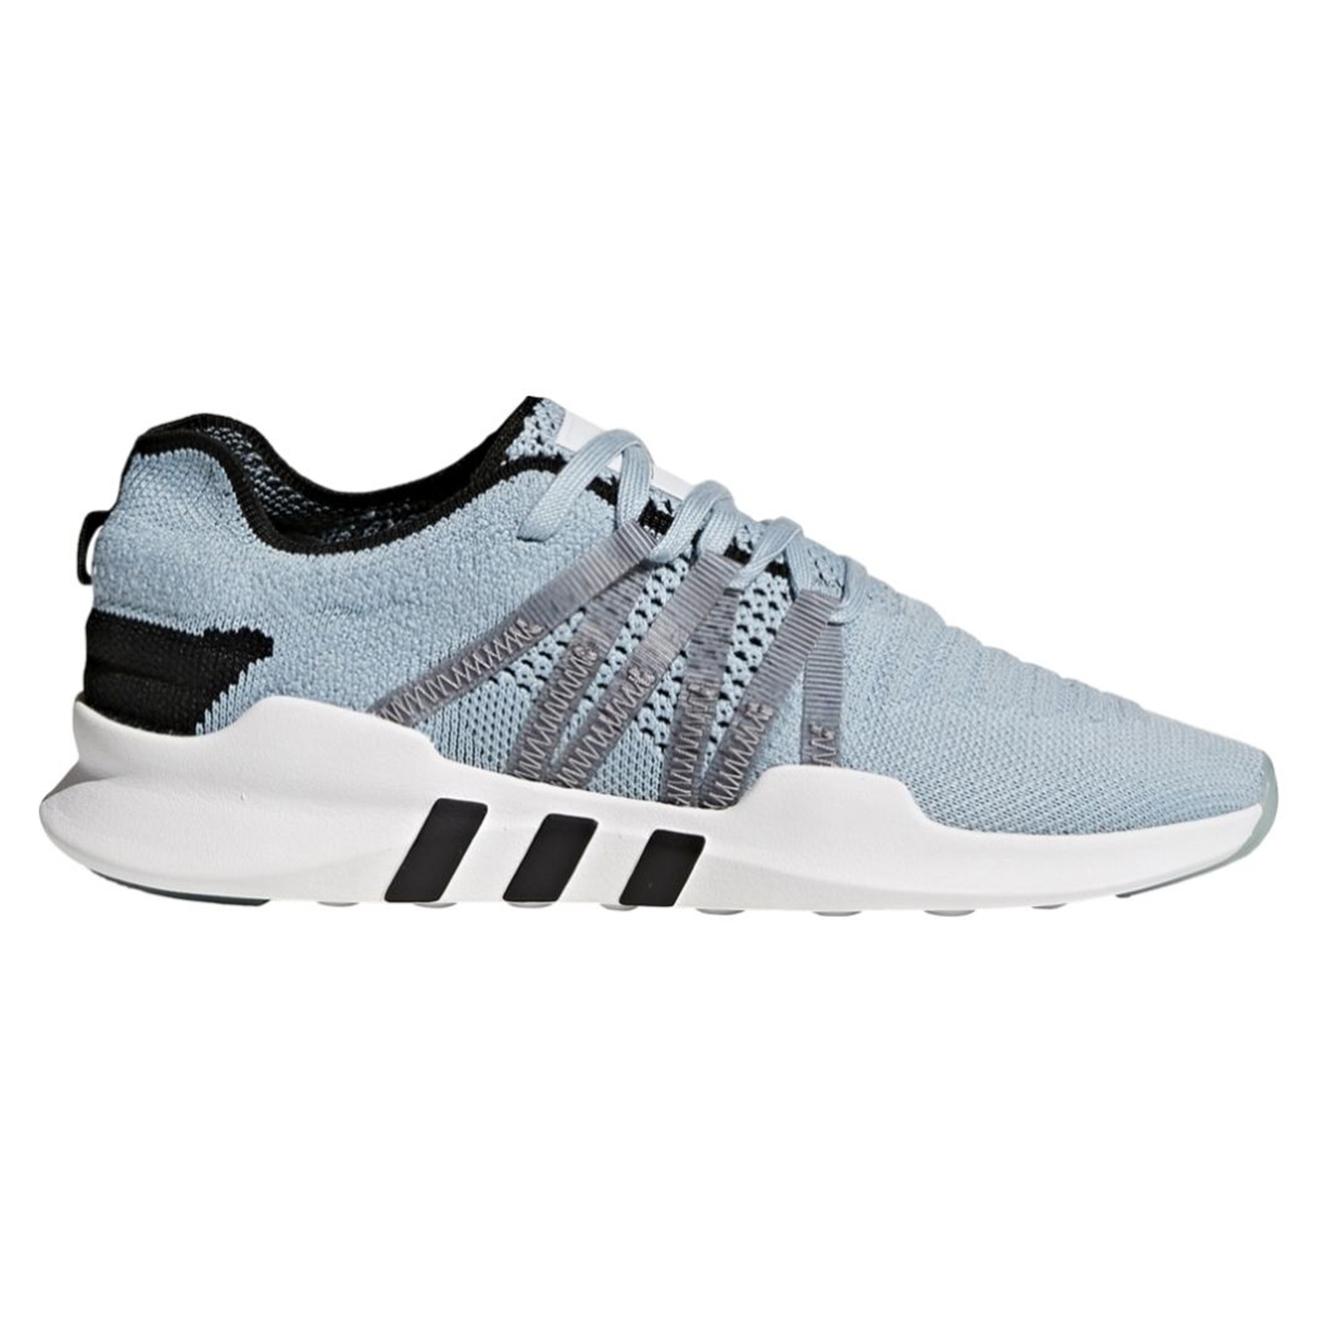 Baskets Eqt Cq2240 bleues - Adidas - Modalova